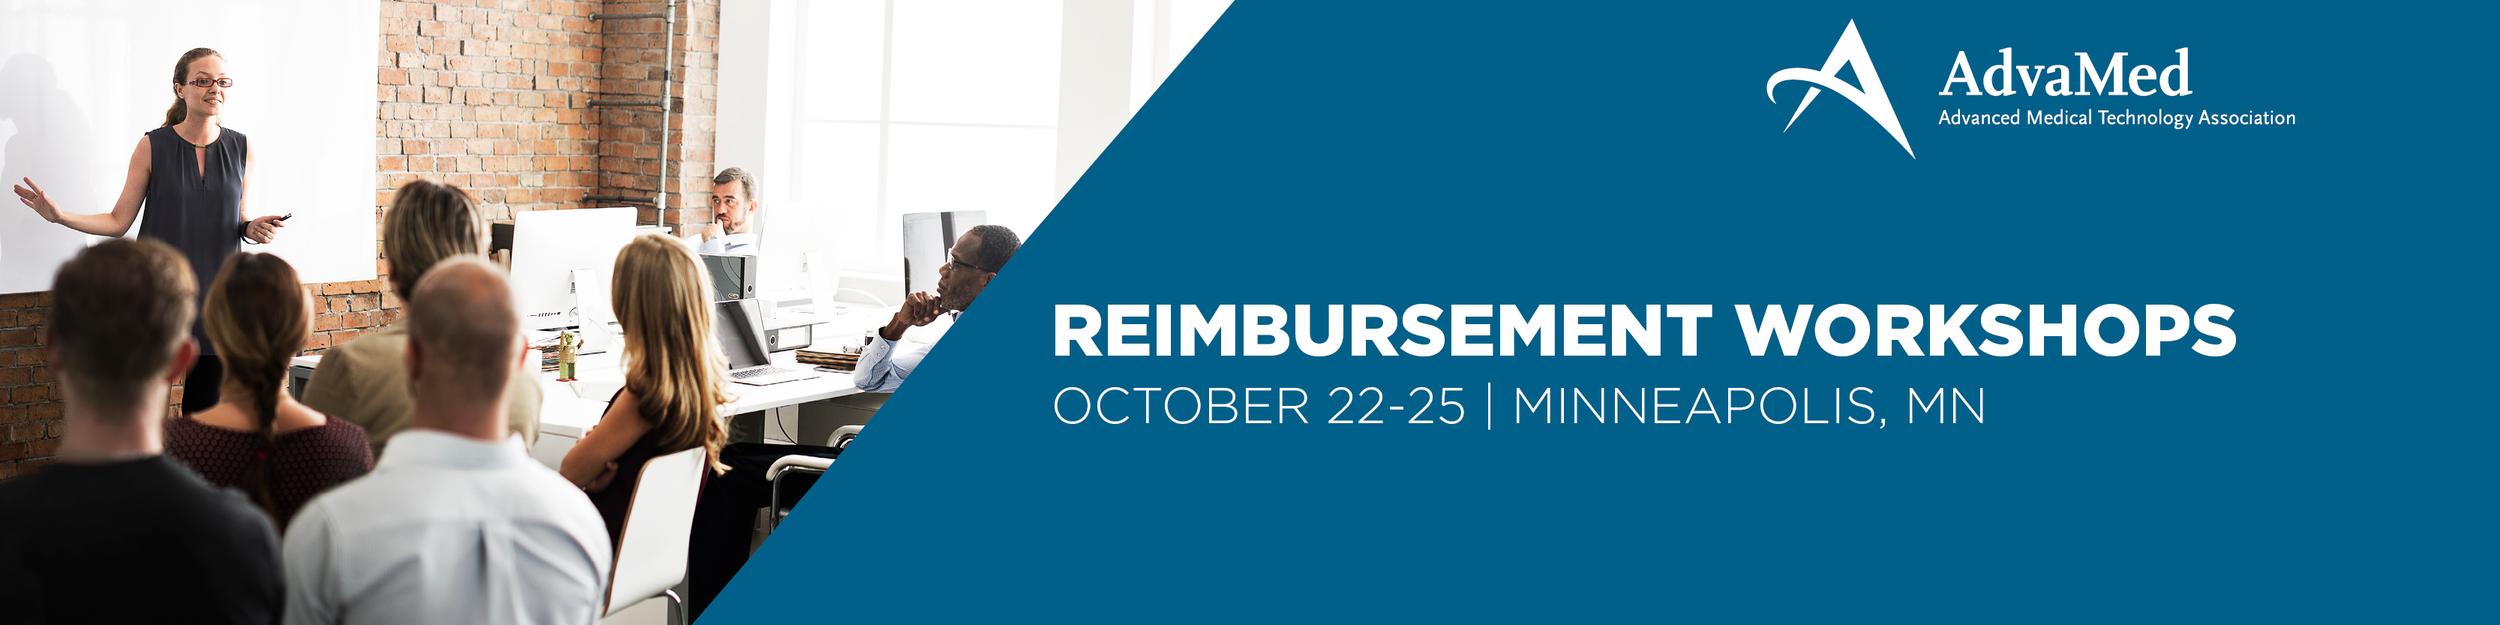 AdvaMed Reimbursement Workshops Banner 10-10-19.png